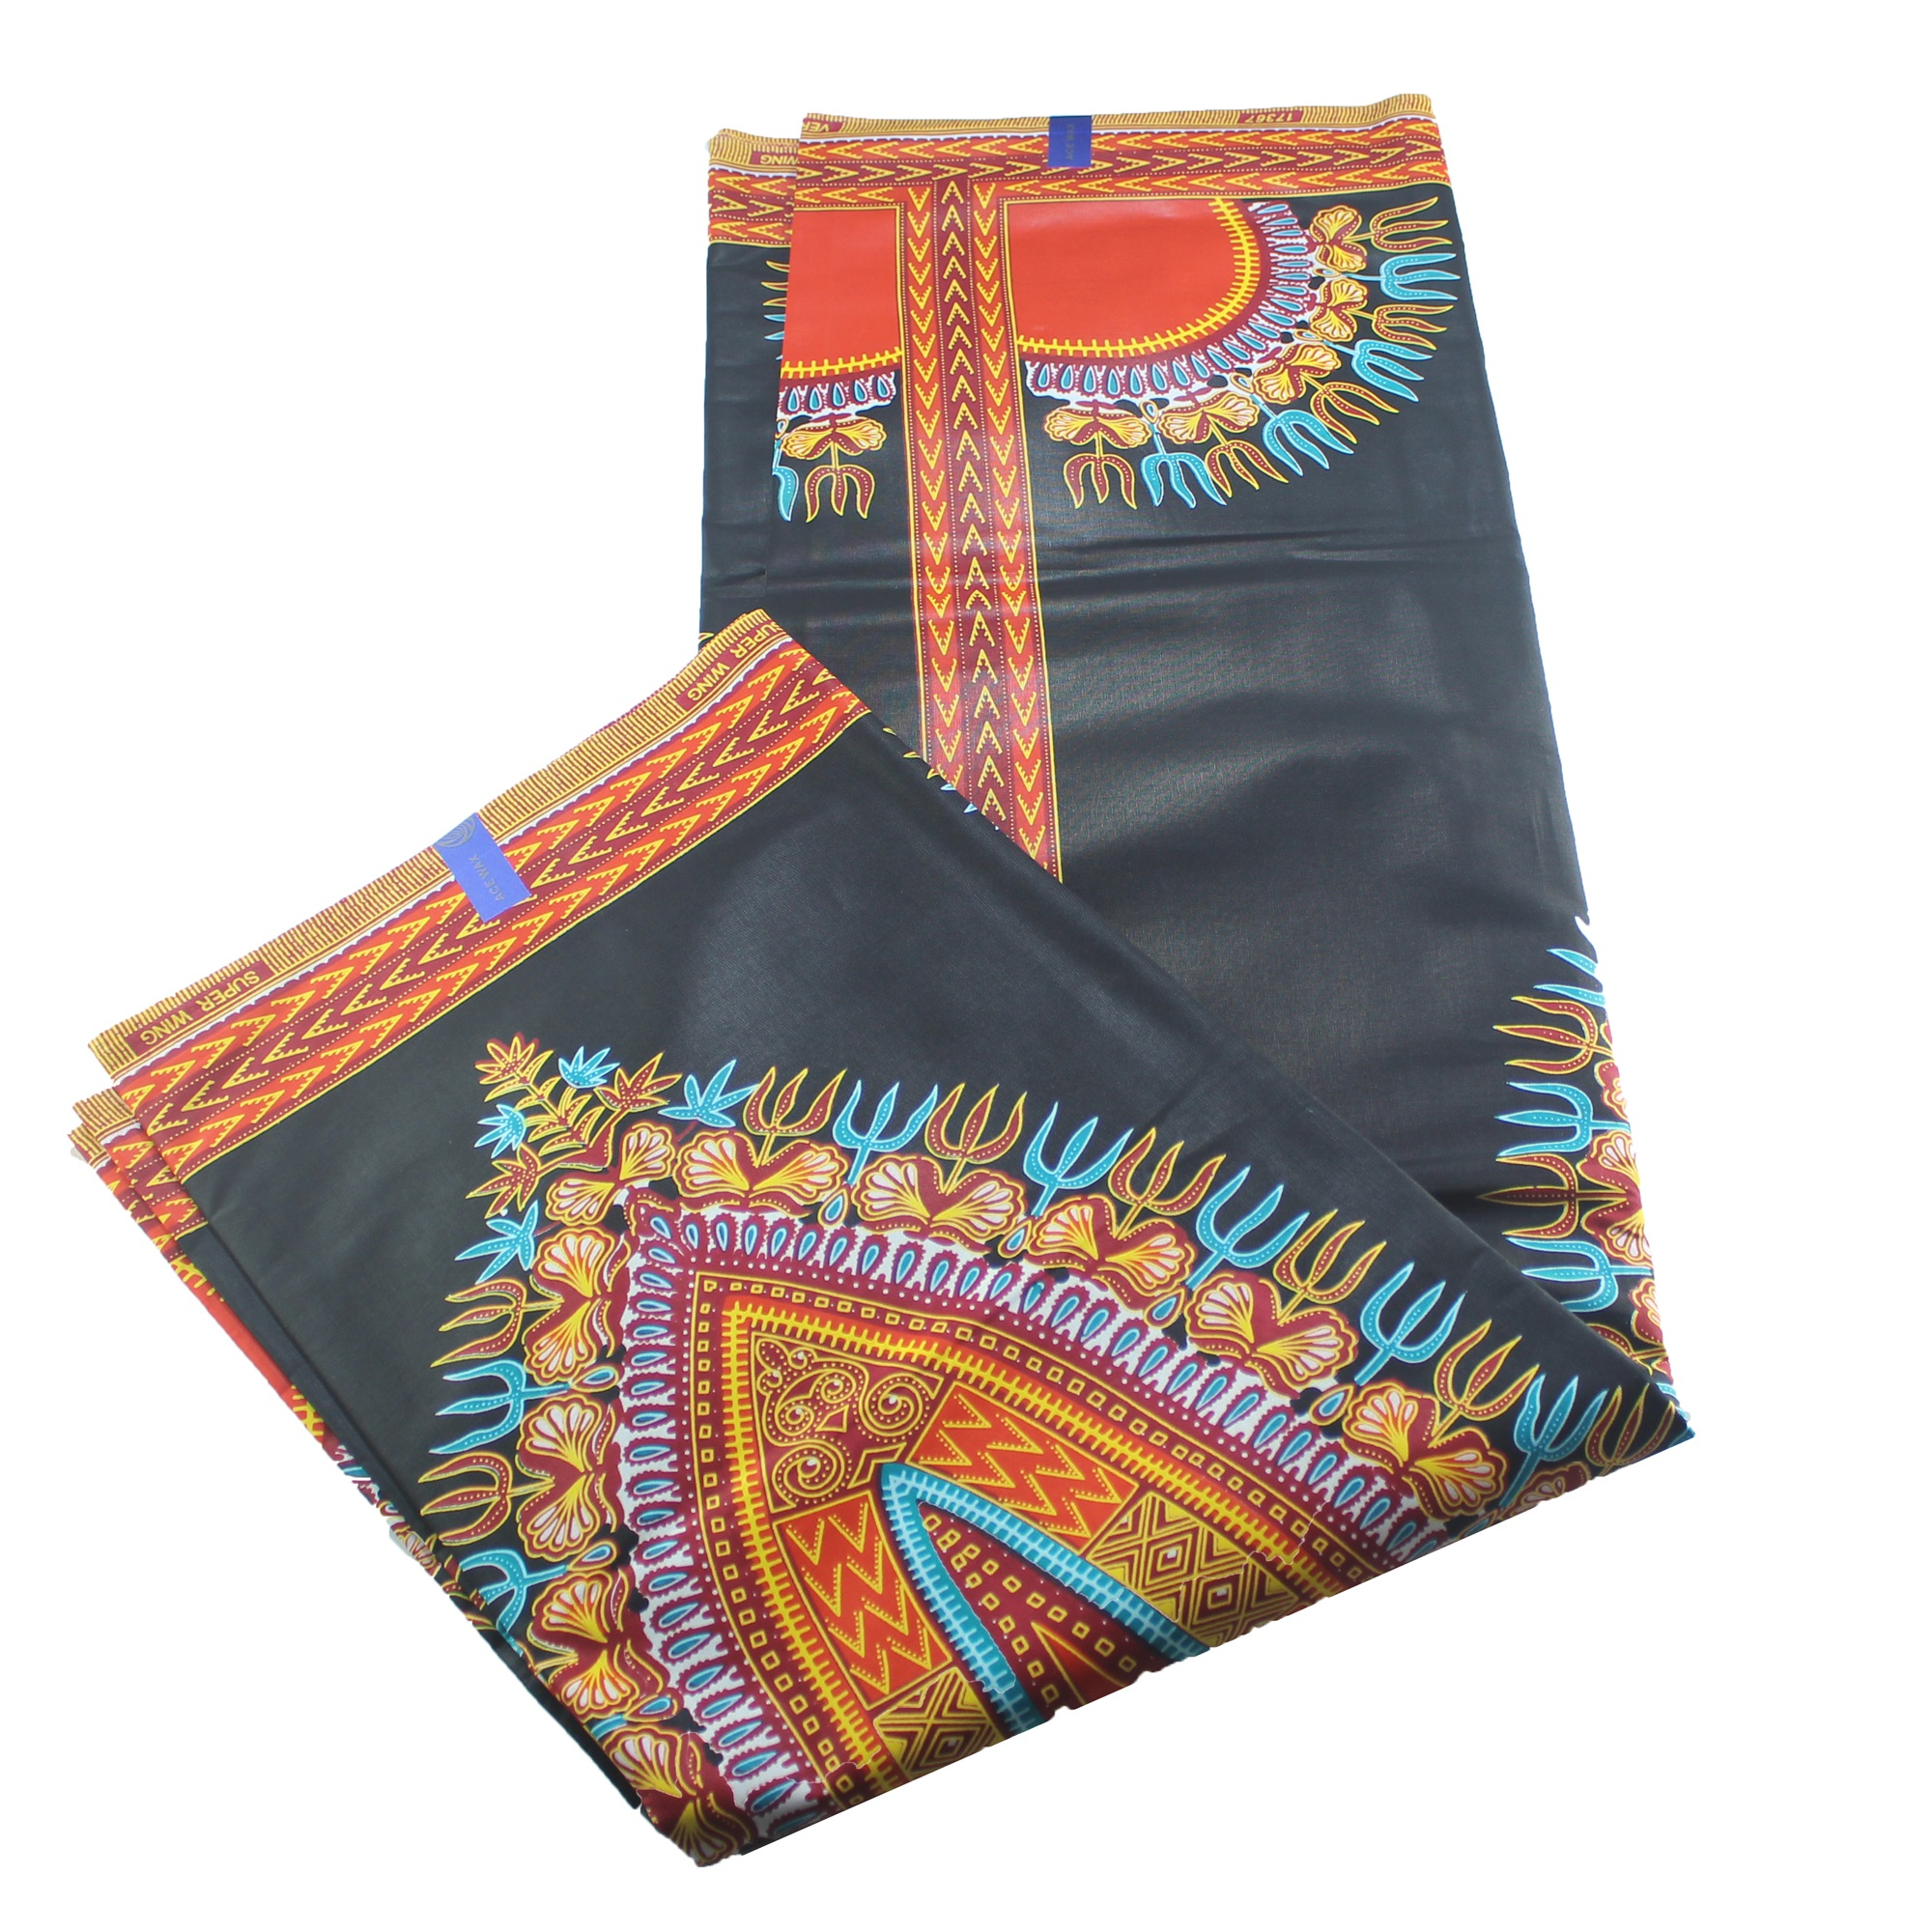 New Dashiki Design Thick Wax Cloth 100% Cotton DIY African Dashiki Fabrics